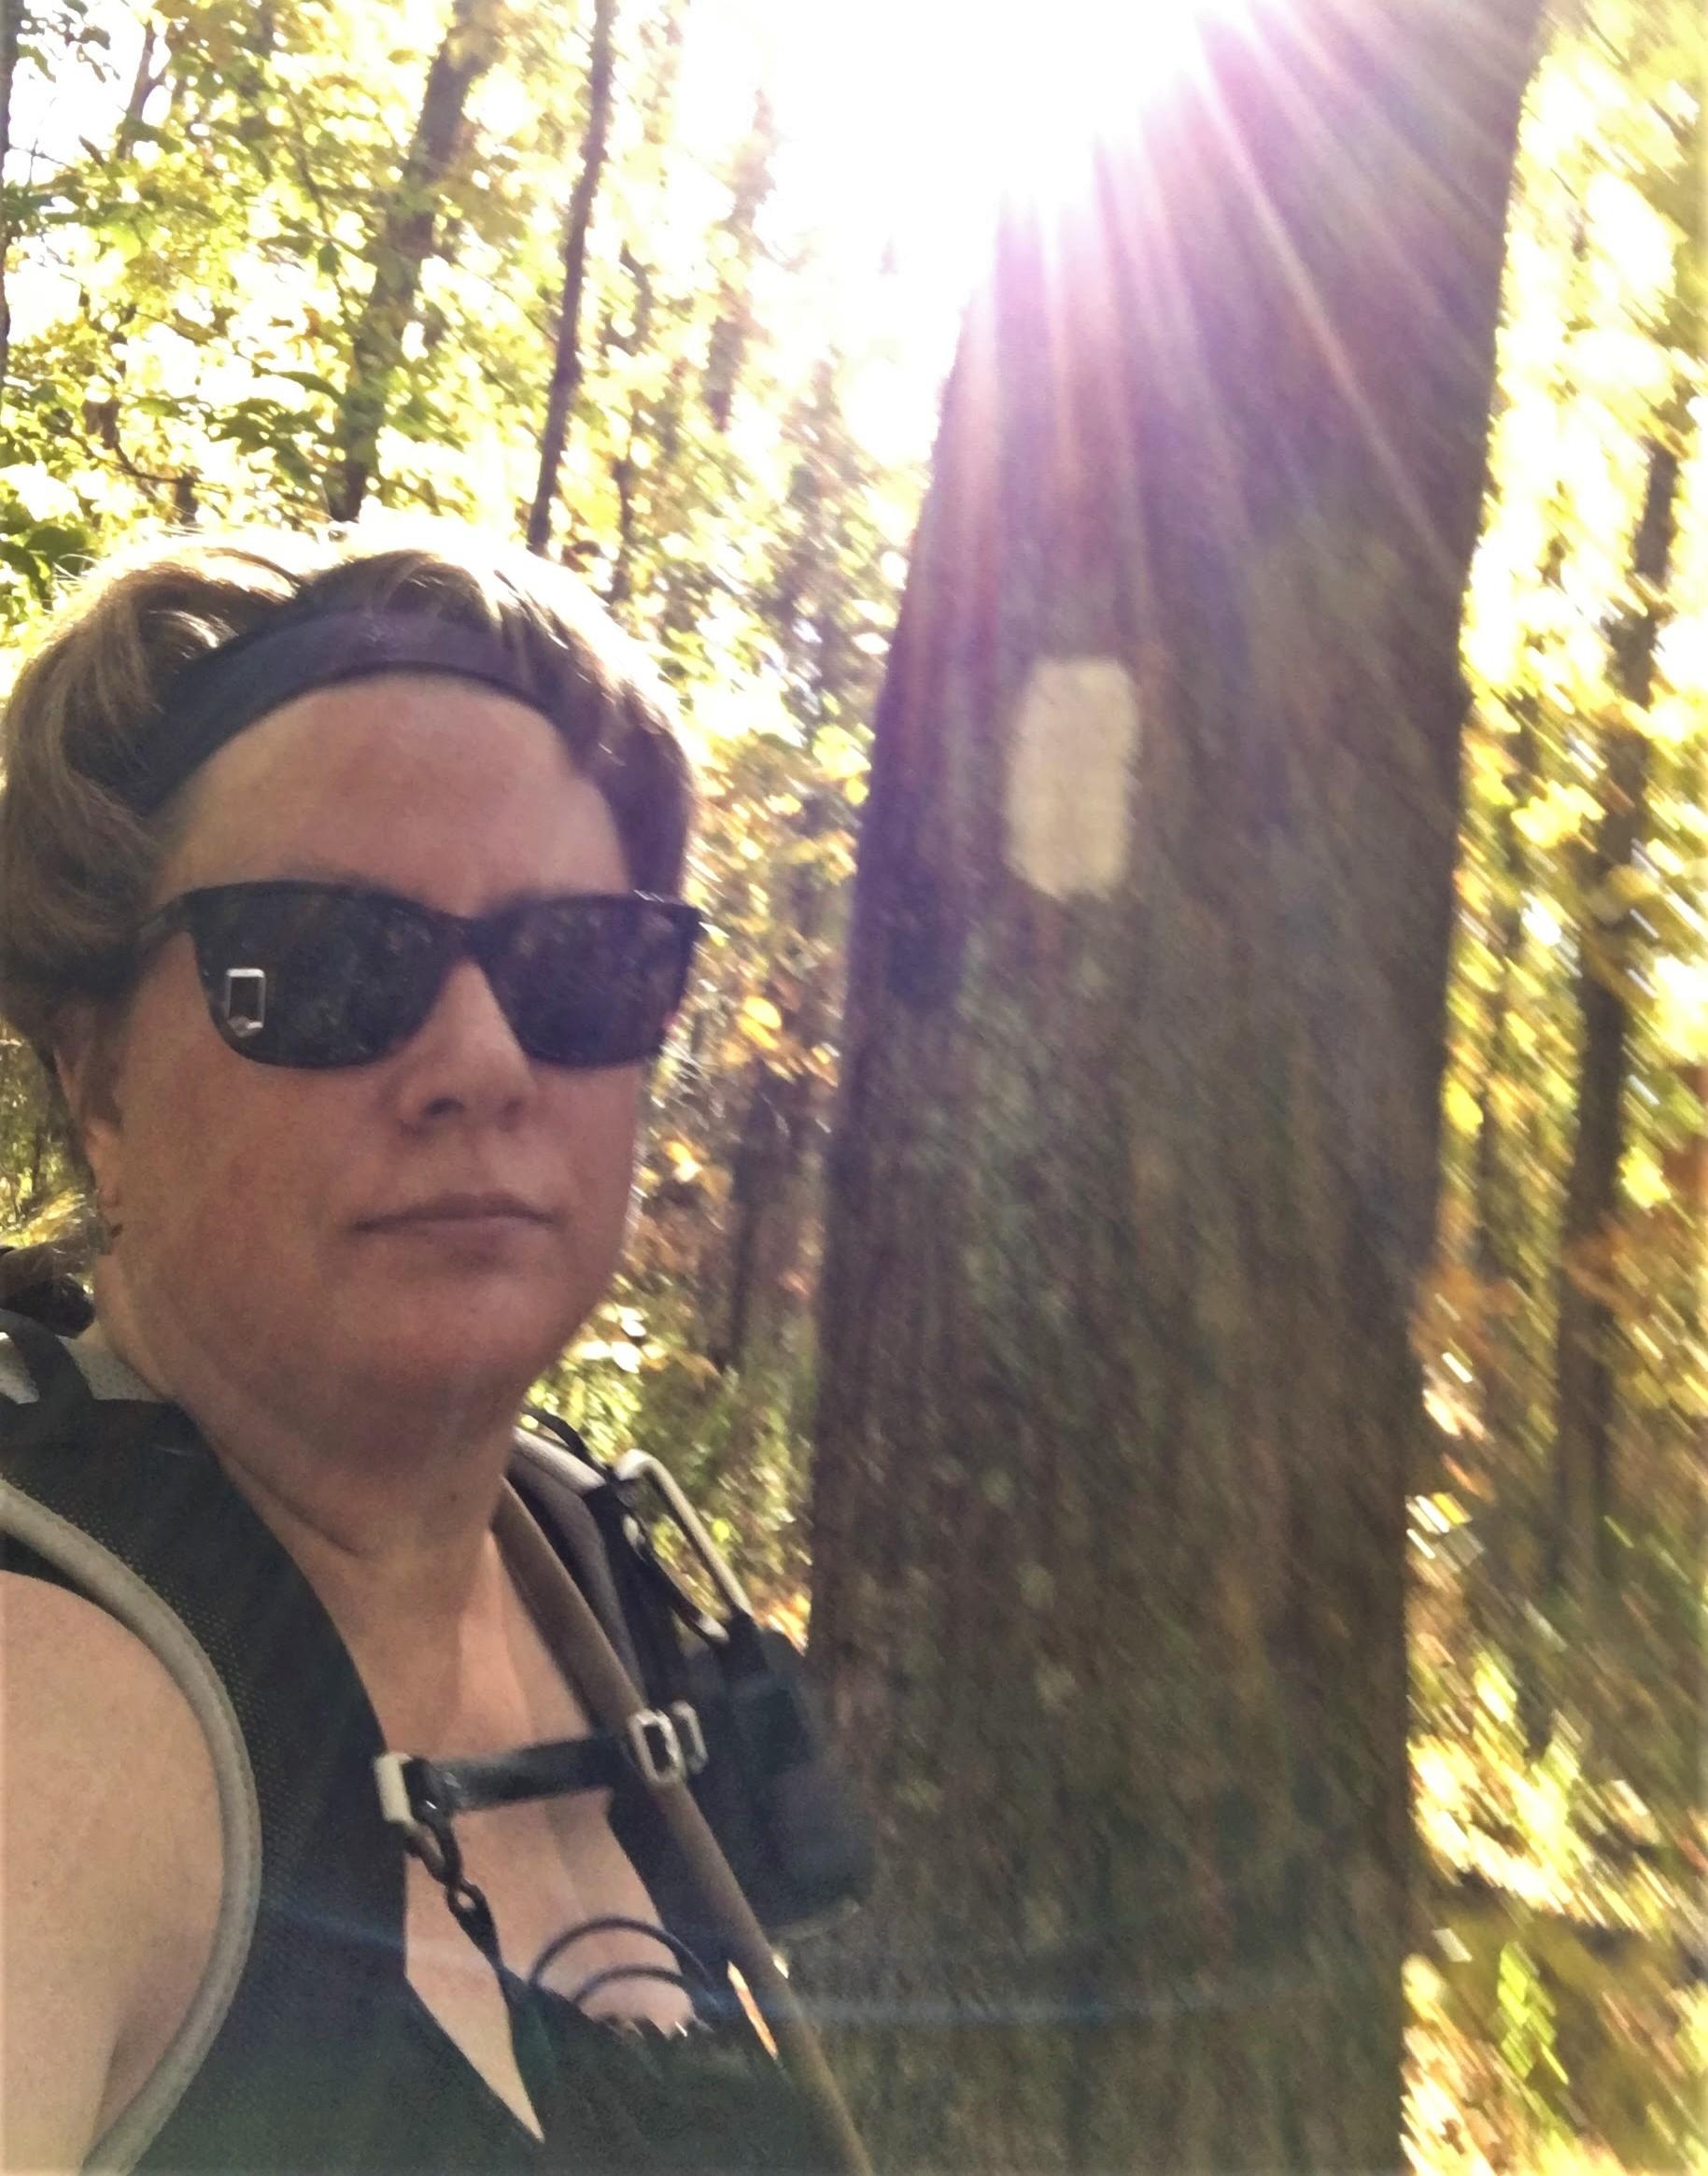 Appalachian Trail thru-hike reasons